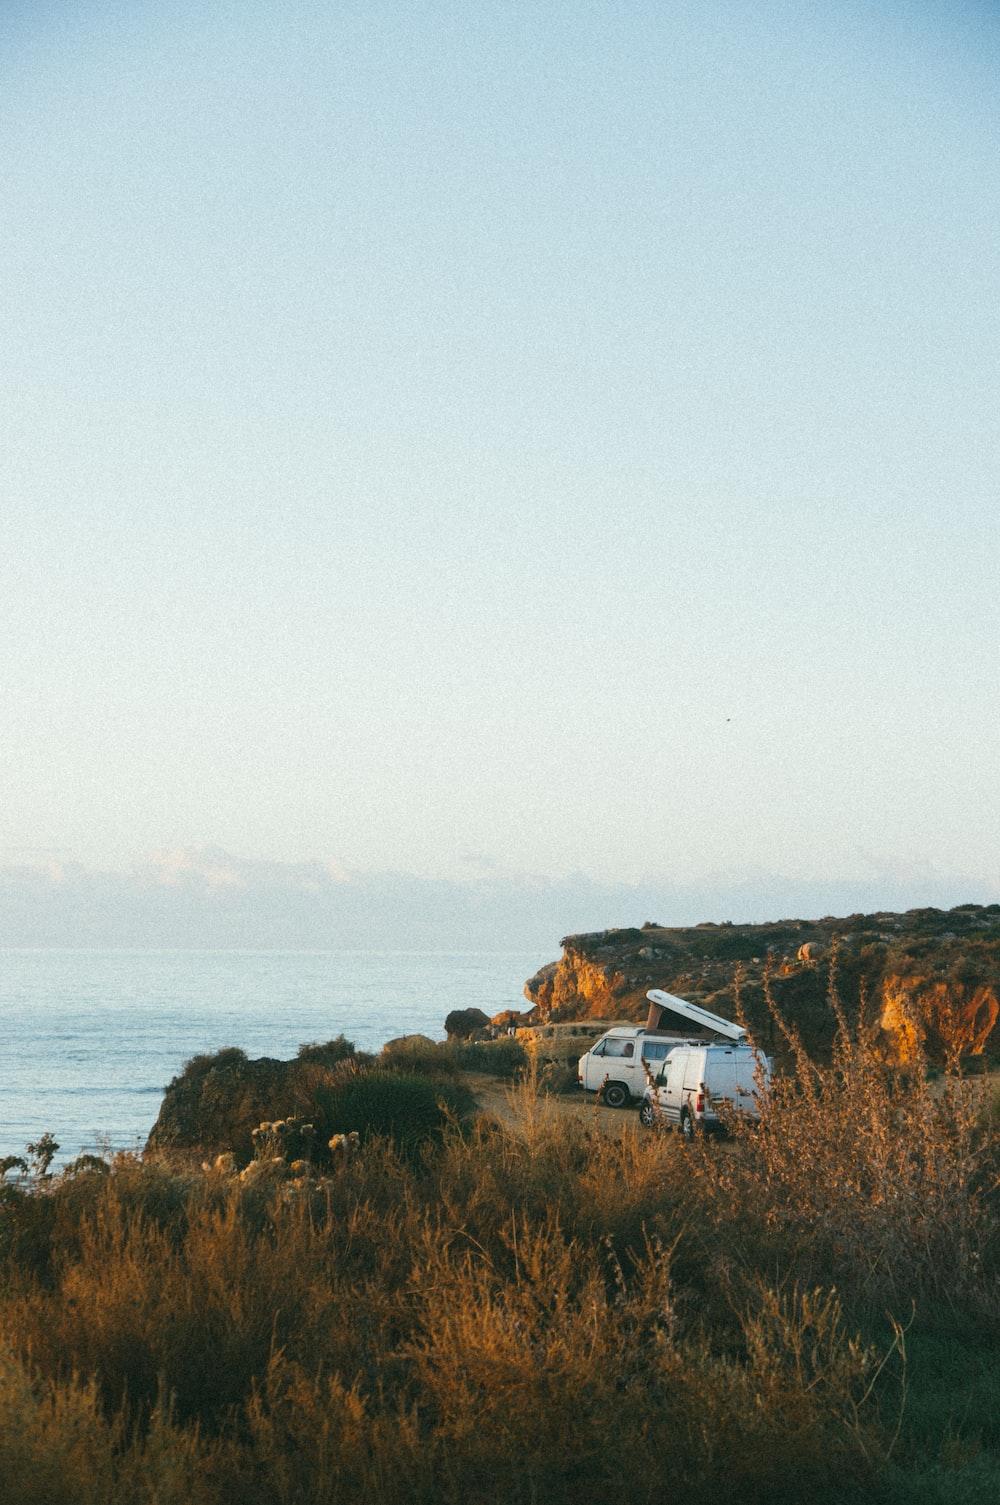 white van near cliff during daytime